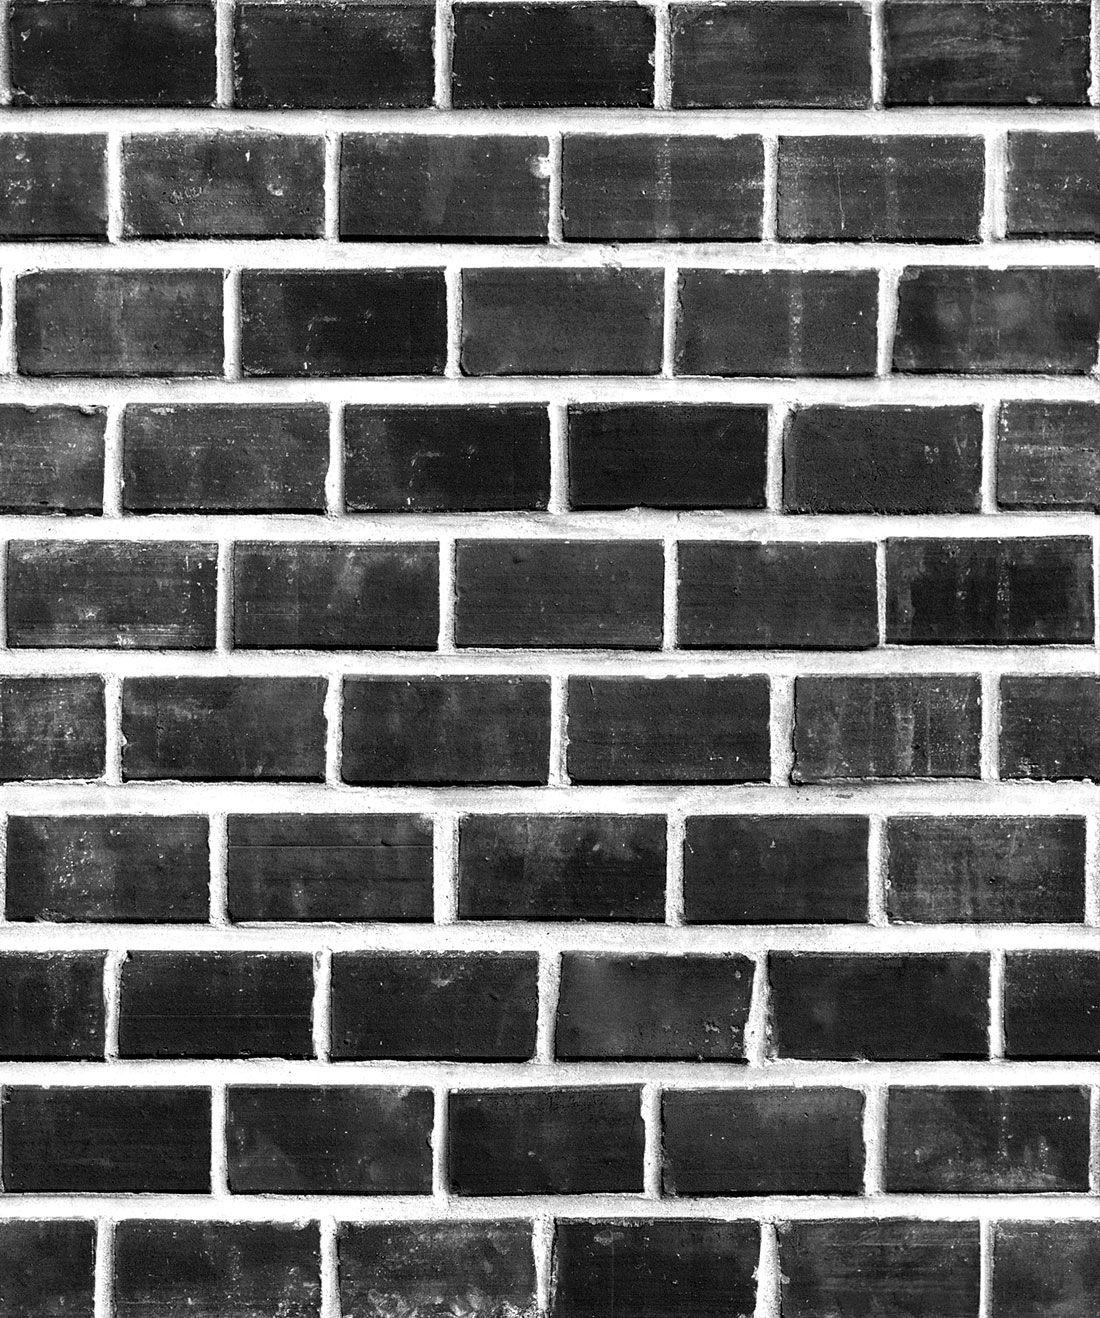 Lubeck Bricks Wallpaper